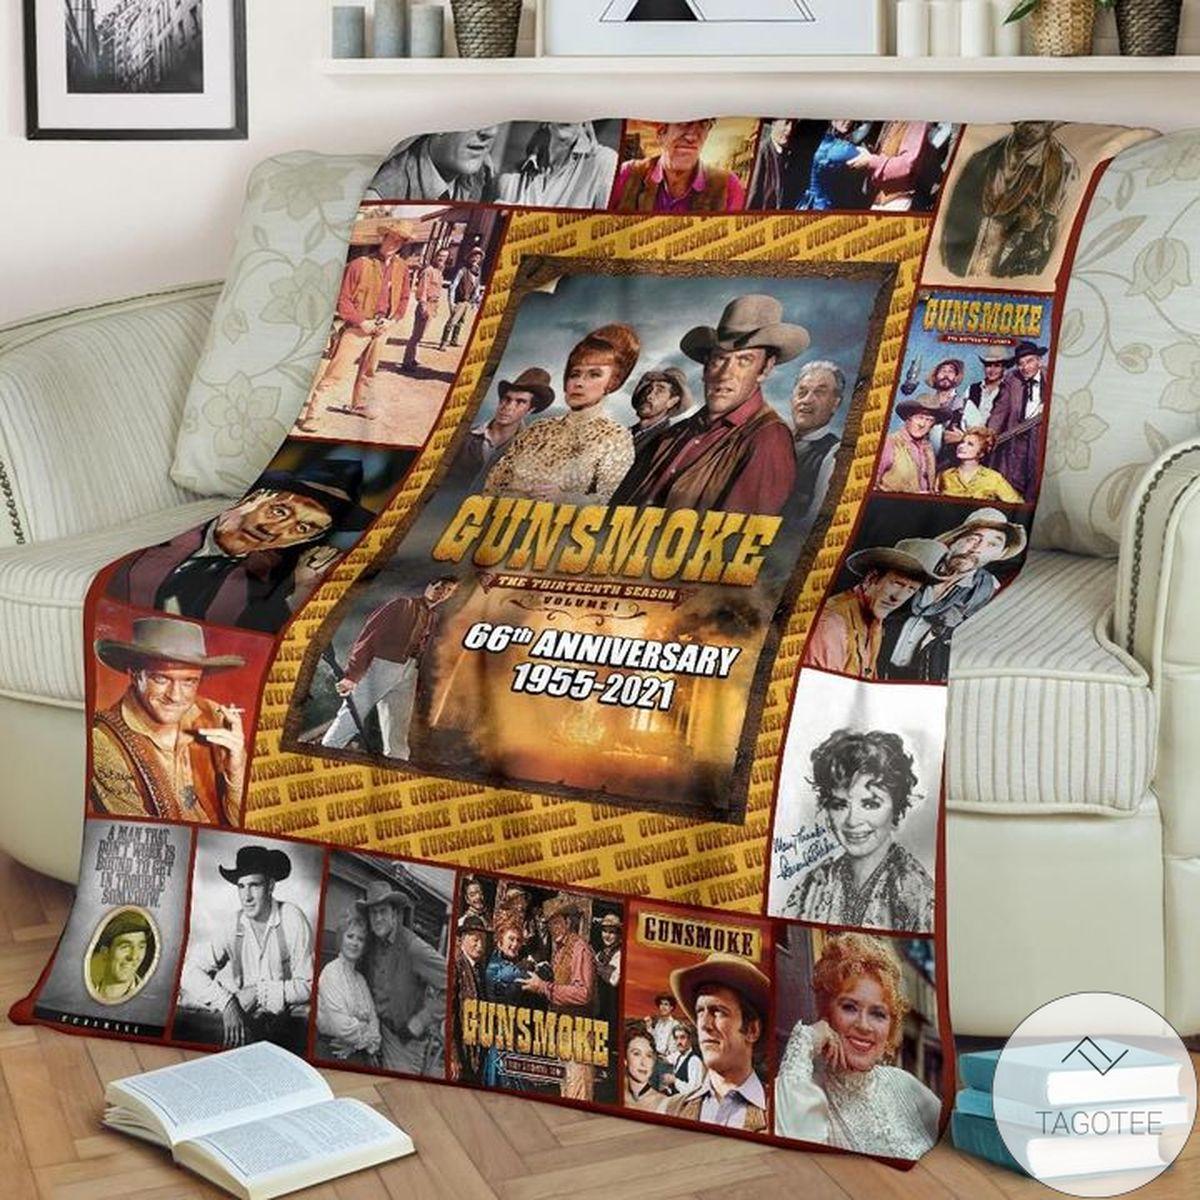 Discount Gunsmoke 66th Anniversary 1955-2021 Blanket